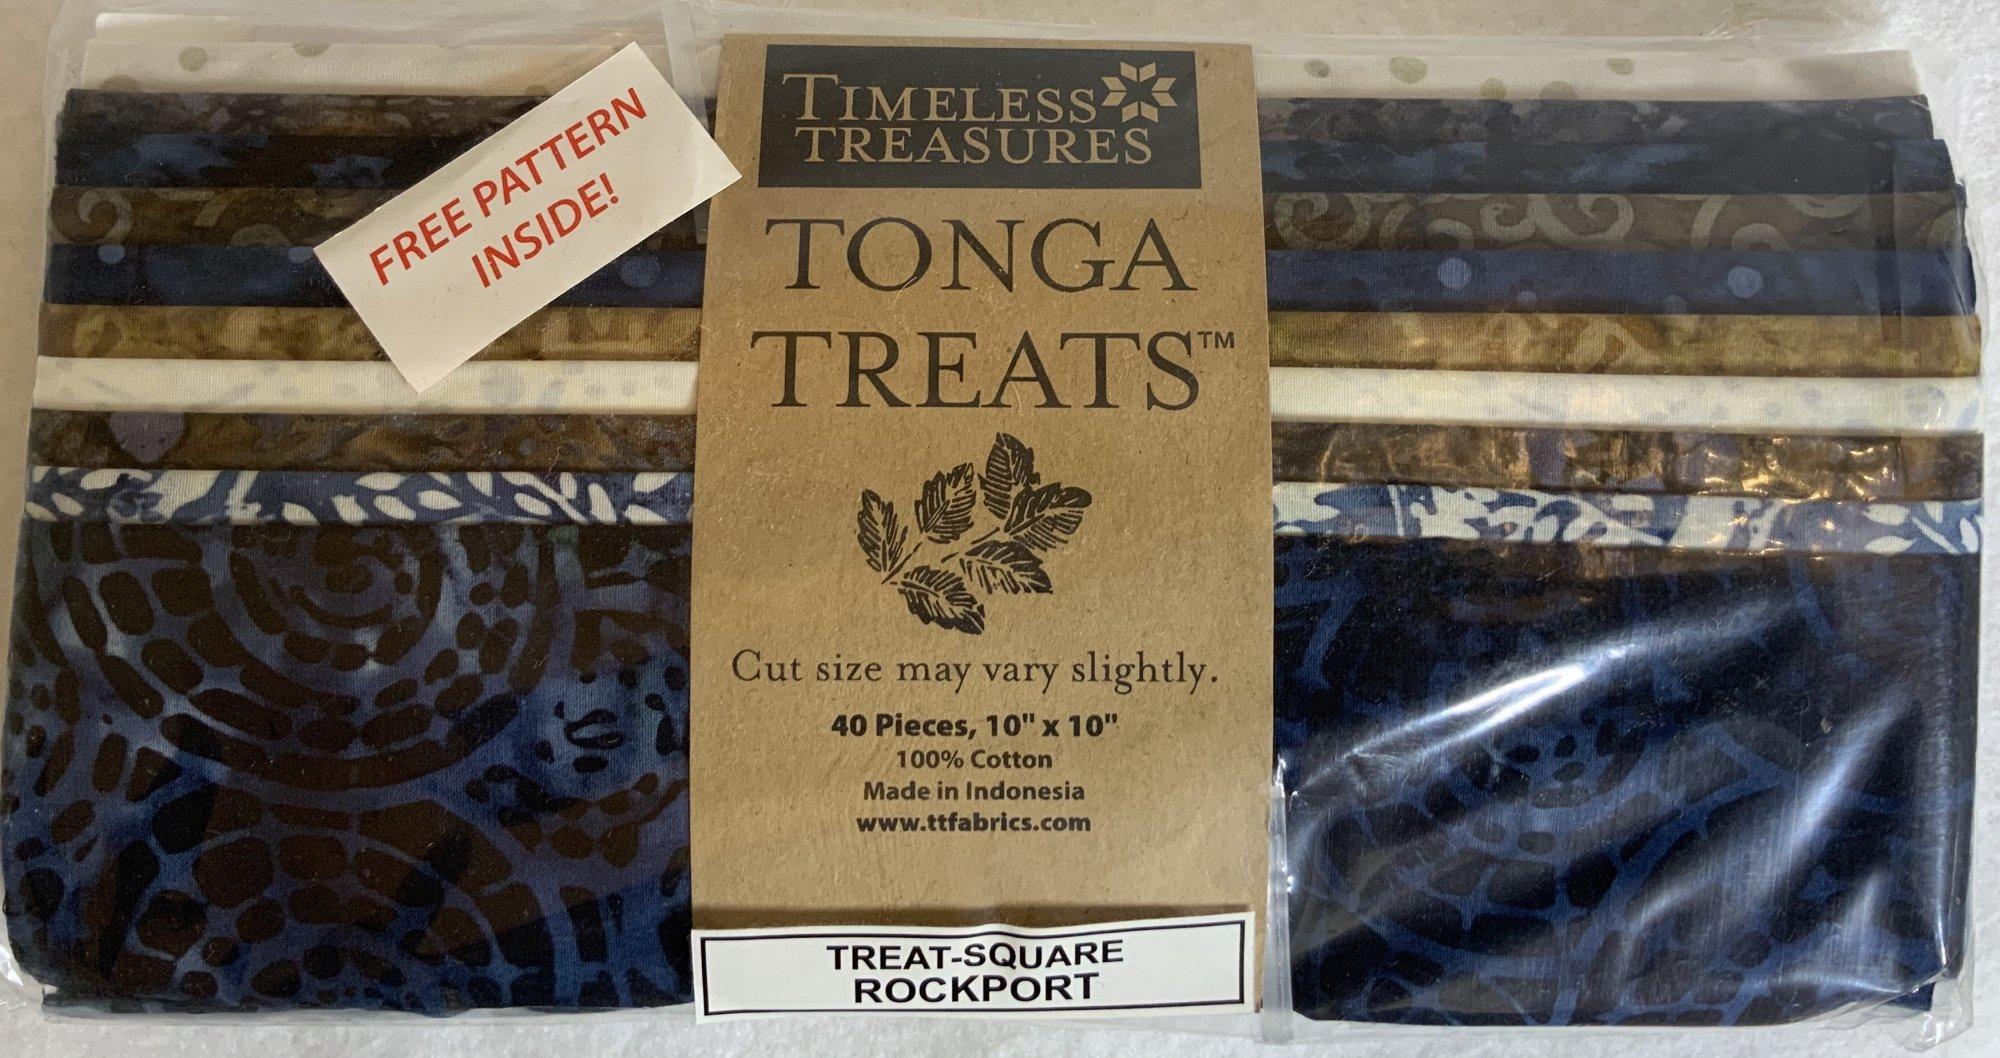 Tonga Treats Rockport